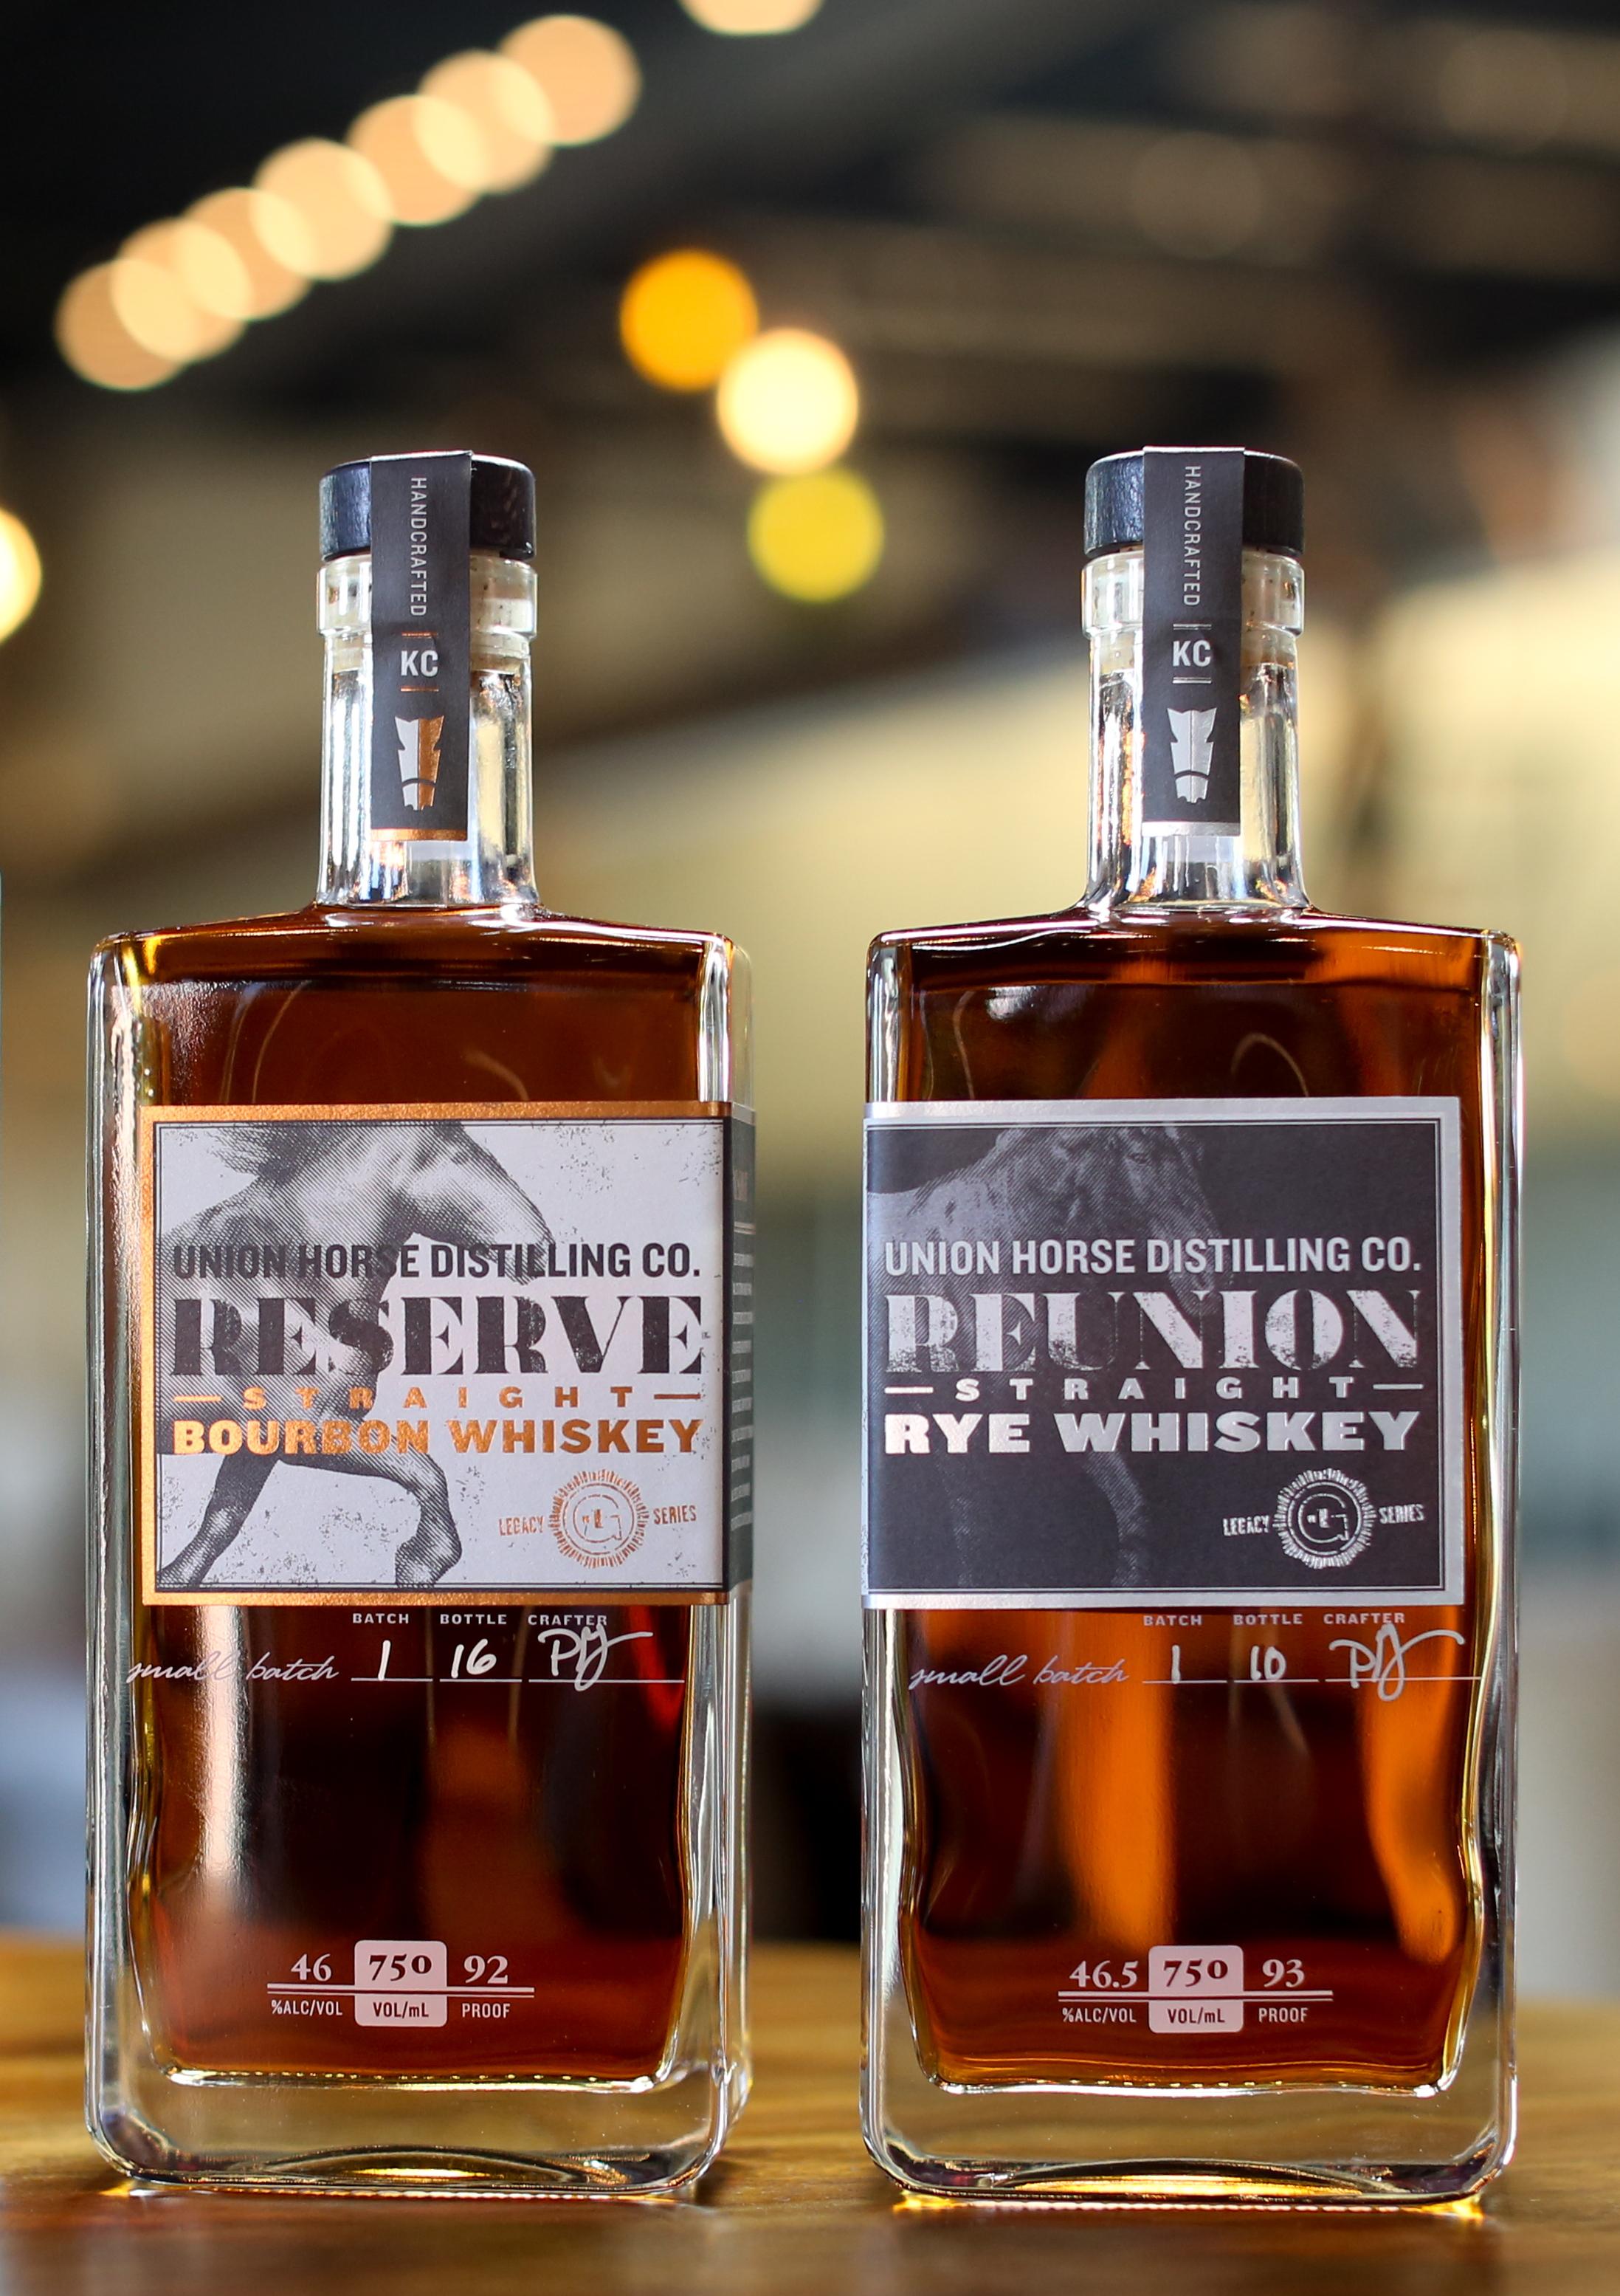 Union Horse Distilling Co Announces Release Of New